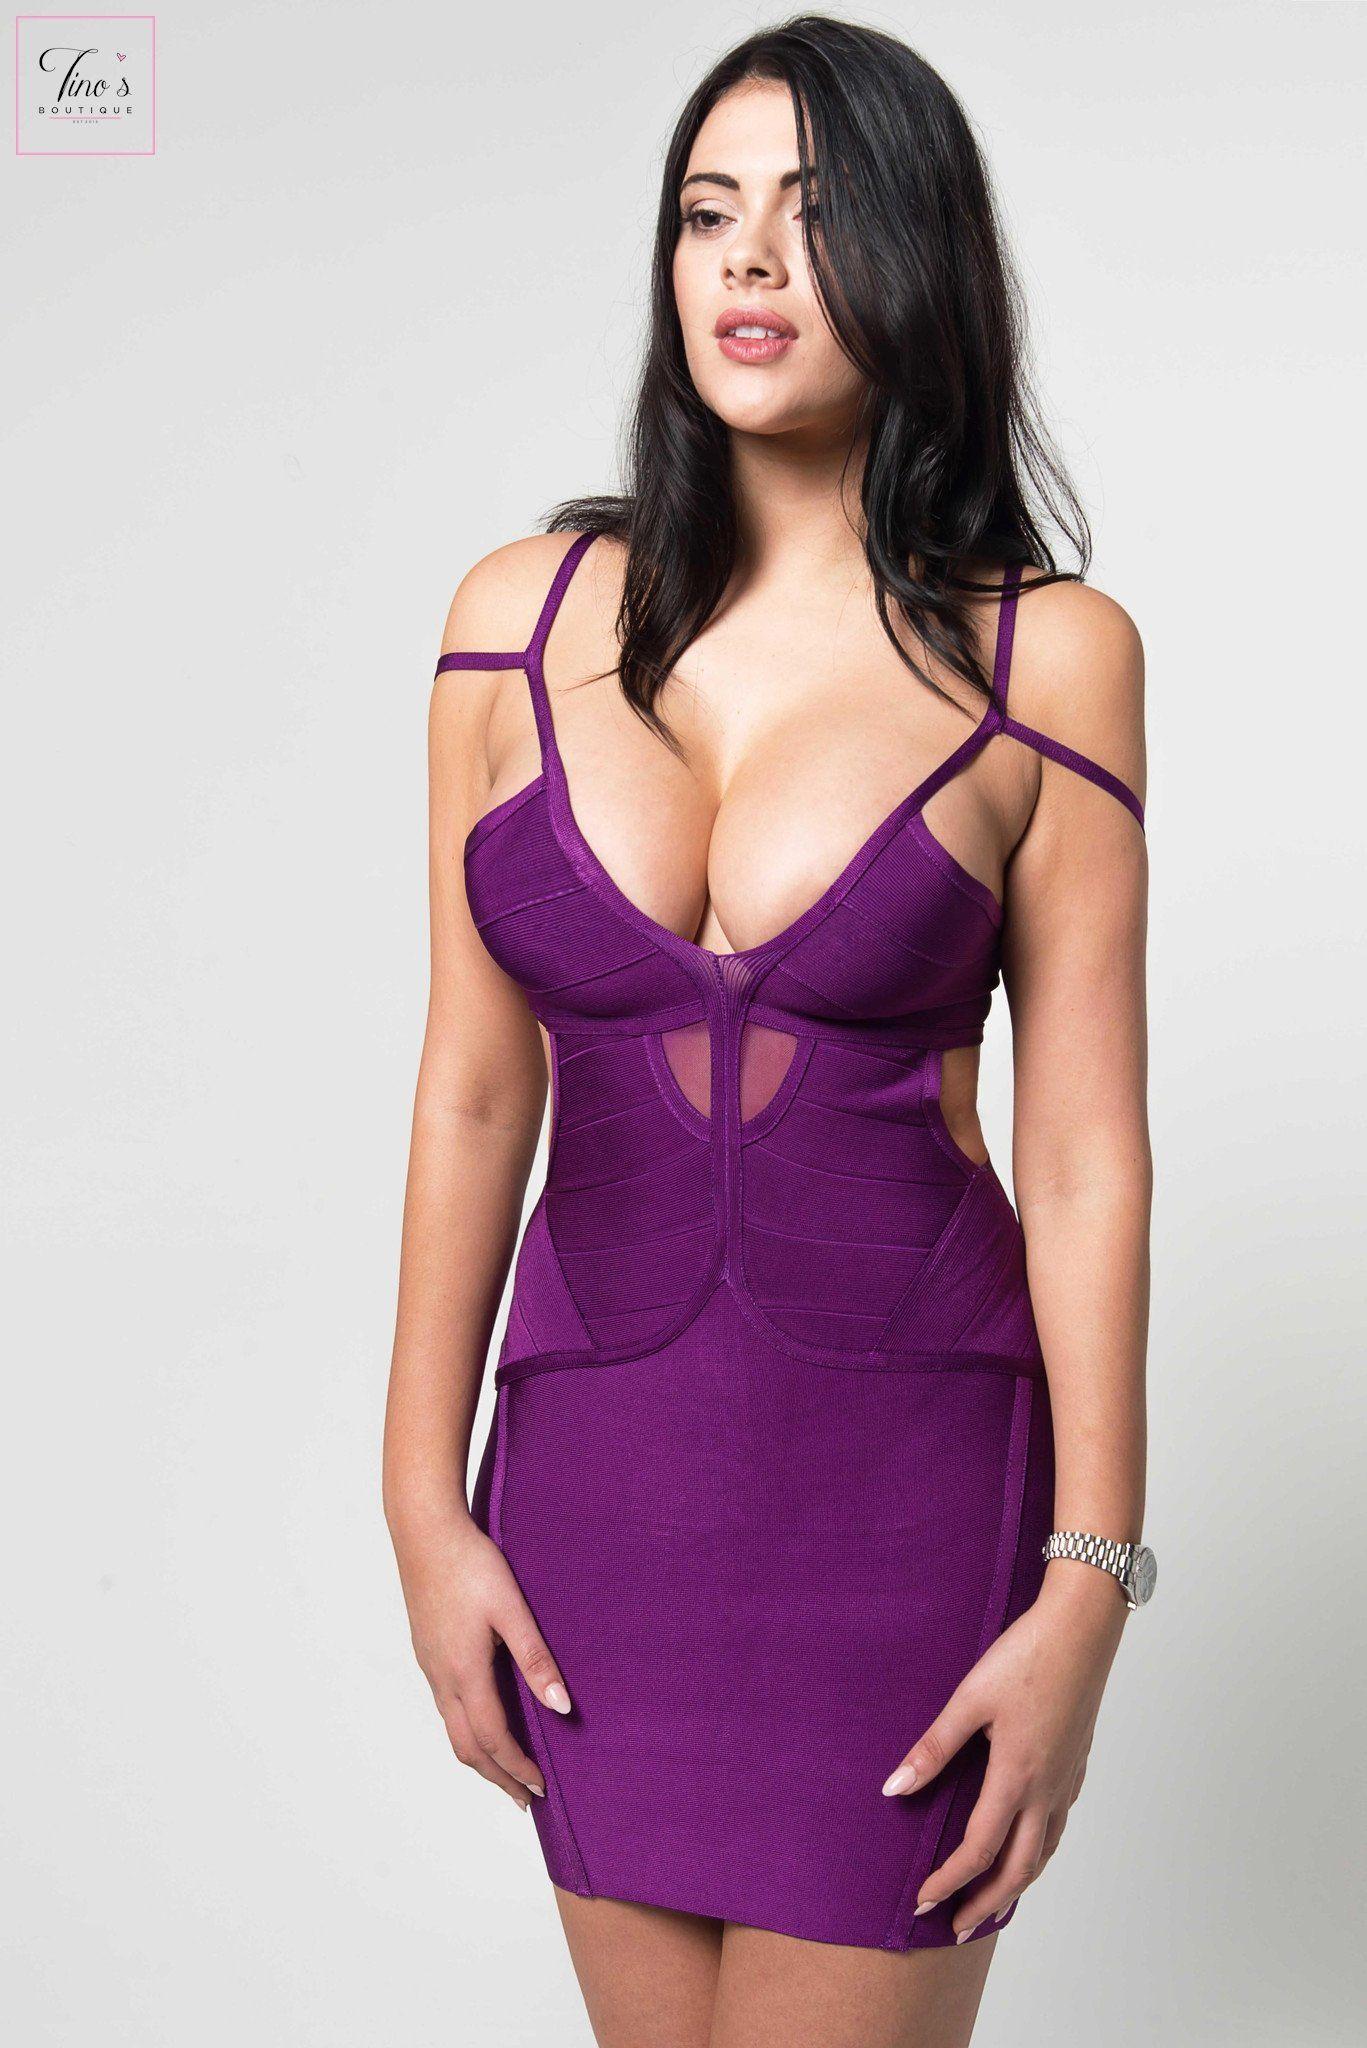 Ellieu purple cutout bandage dress desree